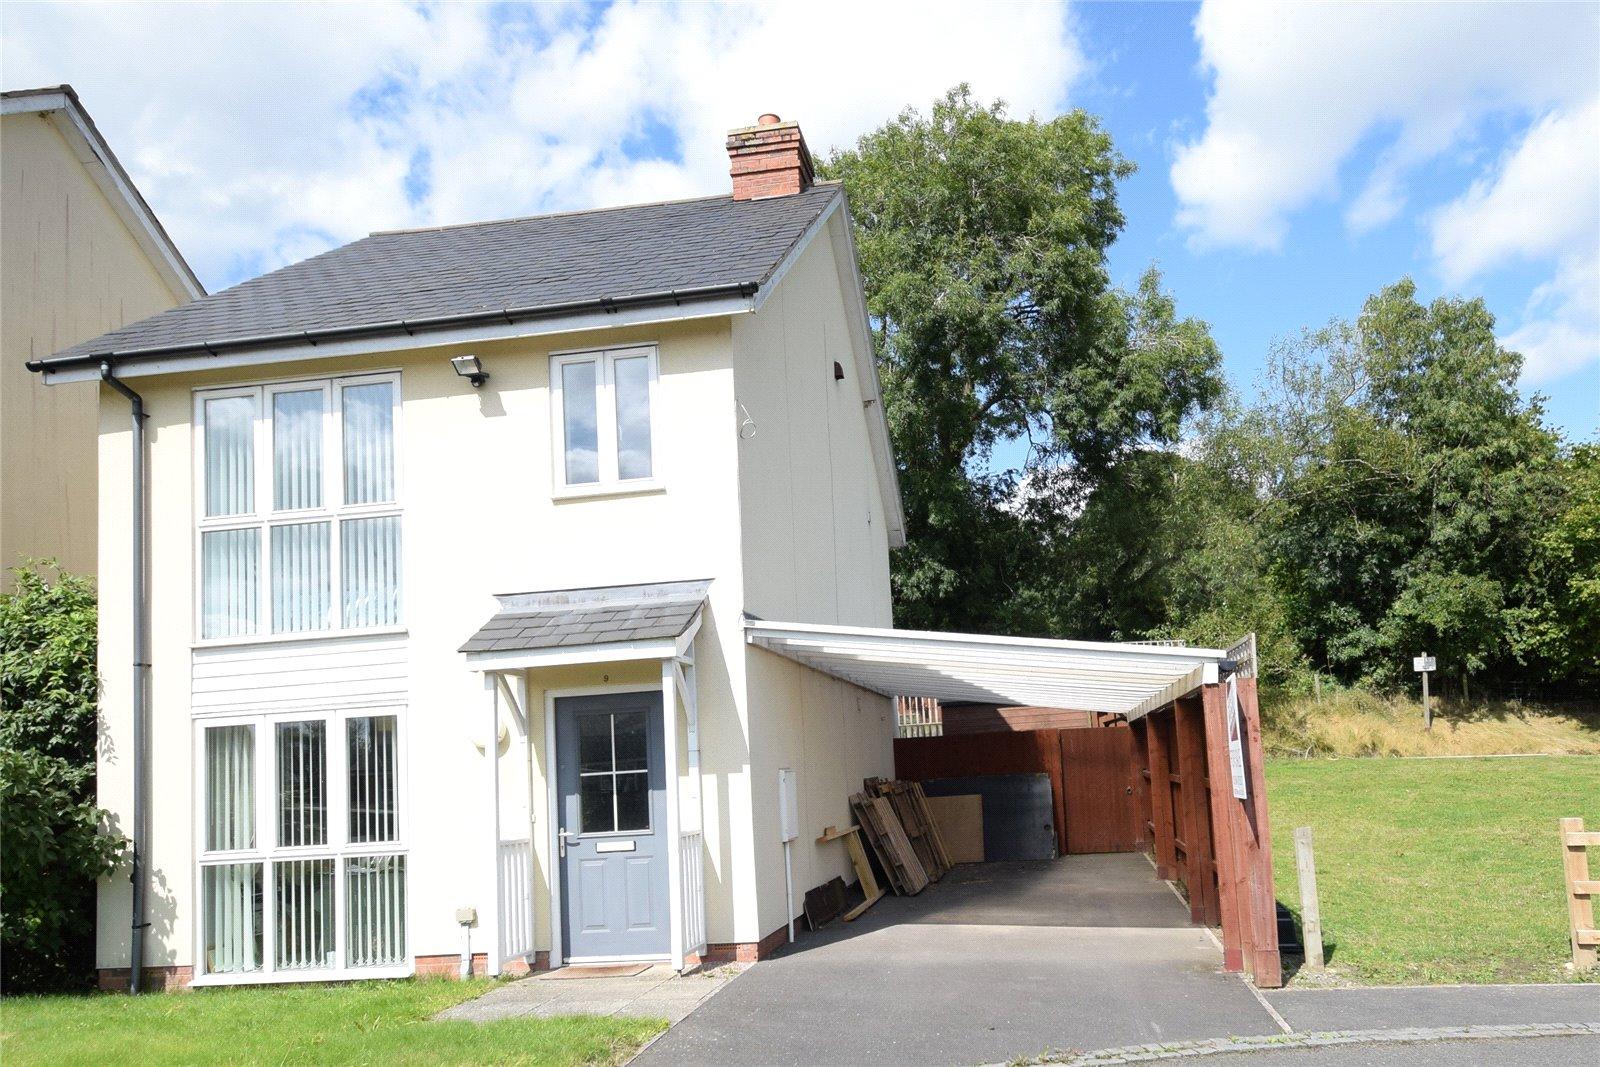 9 Clayton Close, Knowbury, Ludlow, Shropshire, SY8